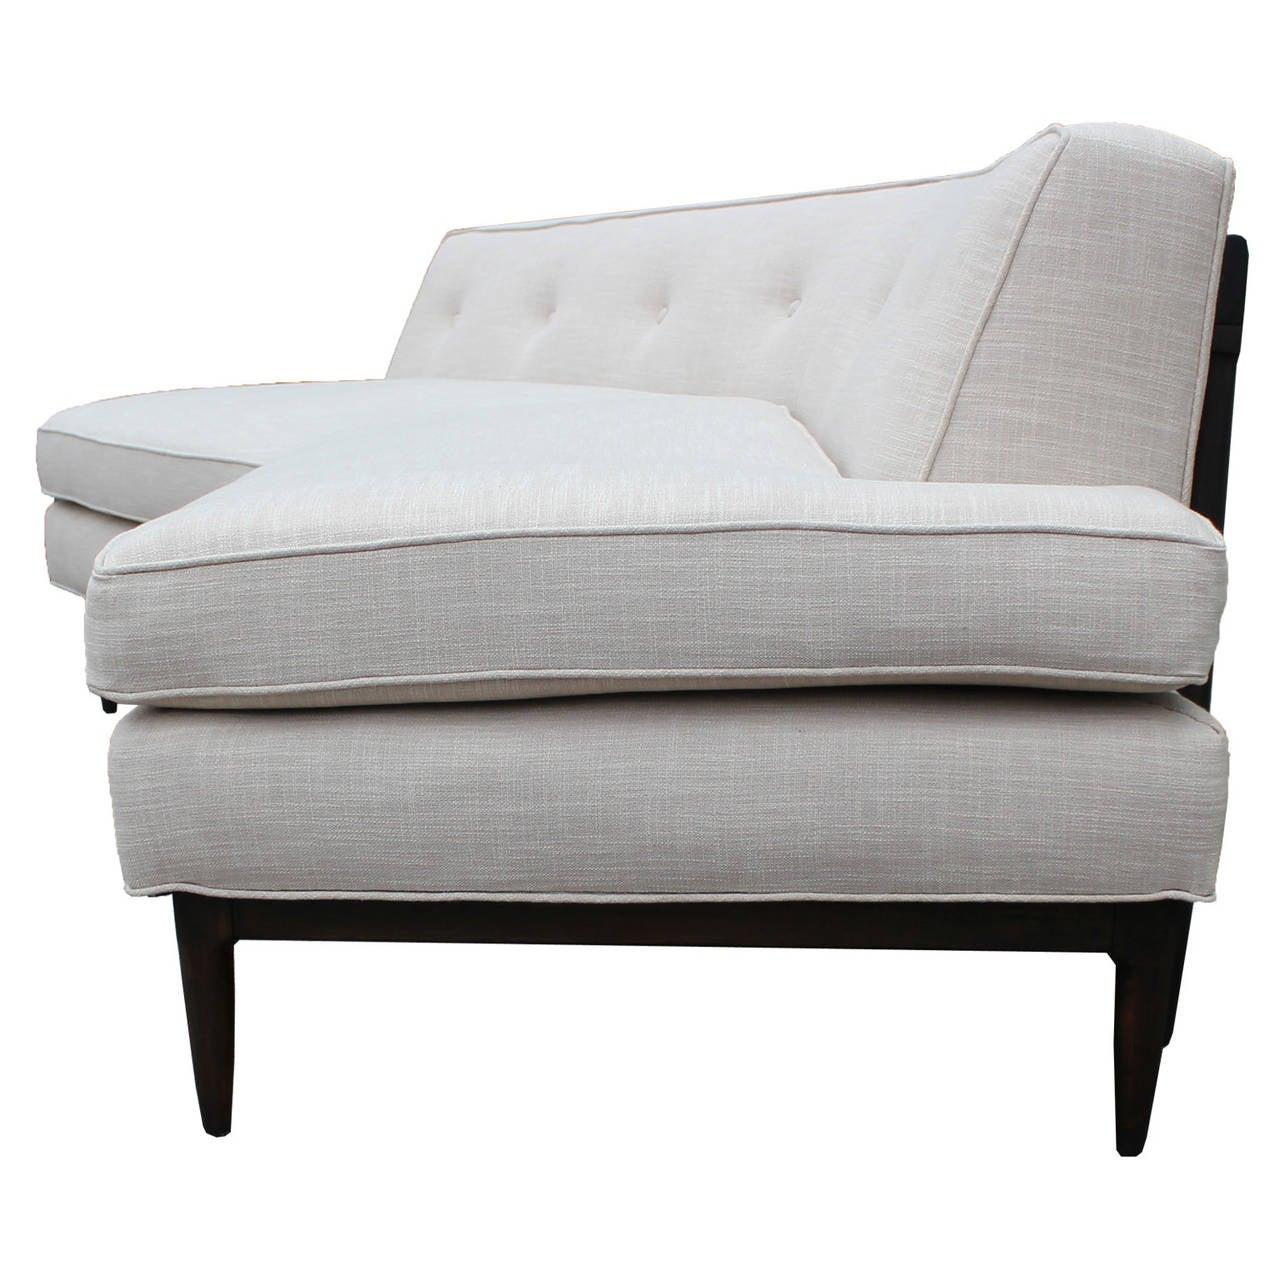 Angled Tomlinson White Linen Sofa At 1stdibs